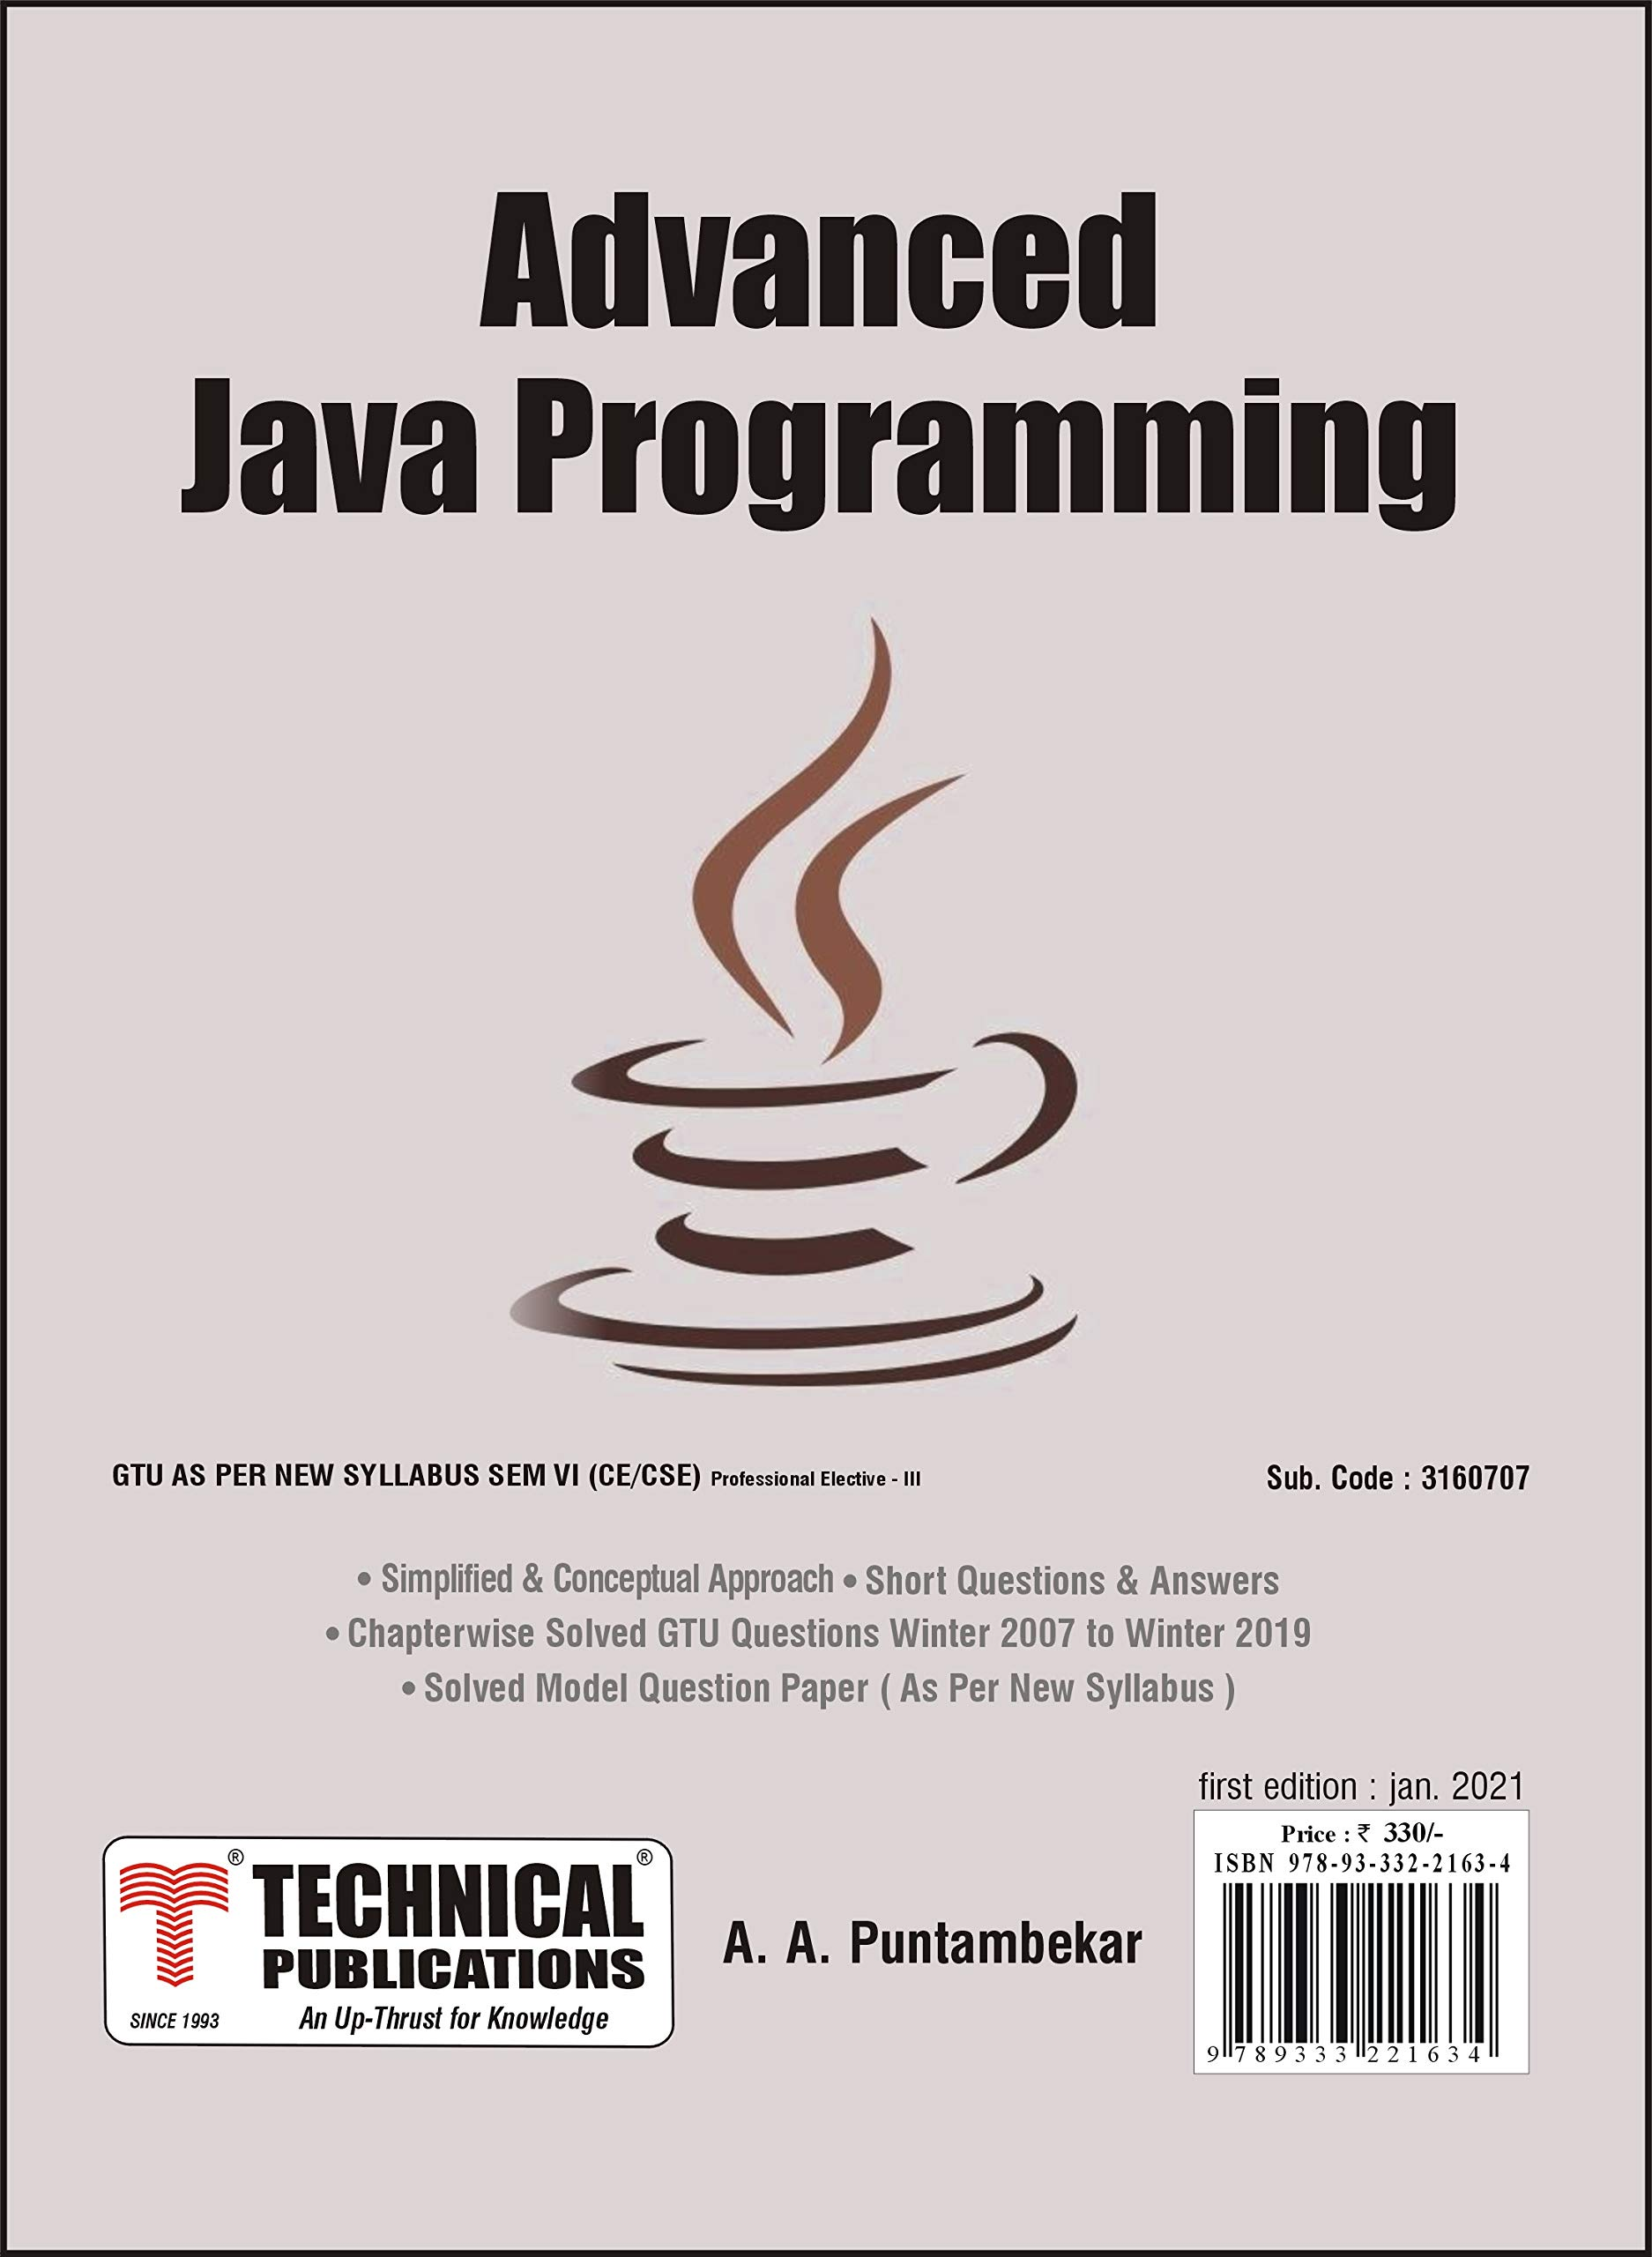 Advanced Java Programming for GTU 18 Course (VI- CSE/Prof. Elec.-III – 3160707)